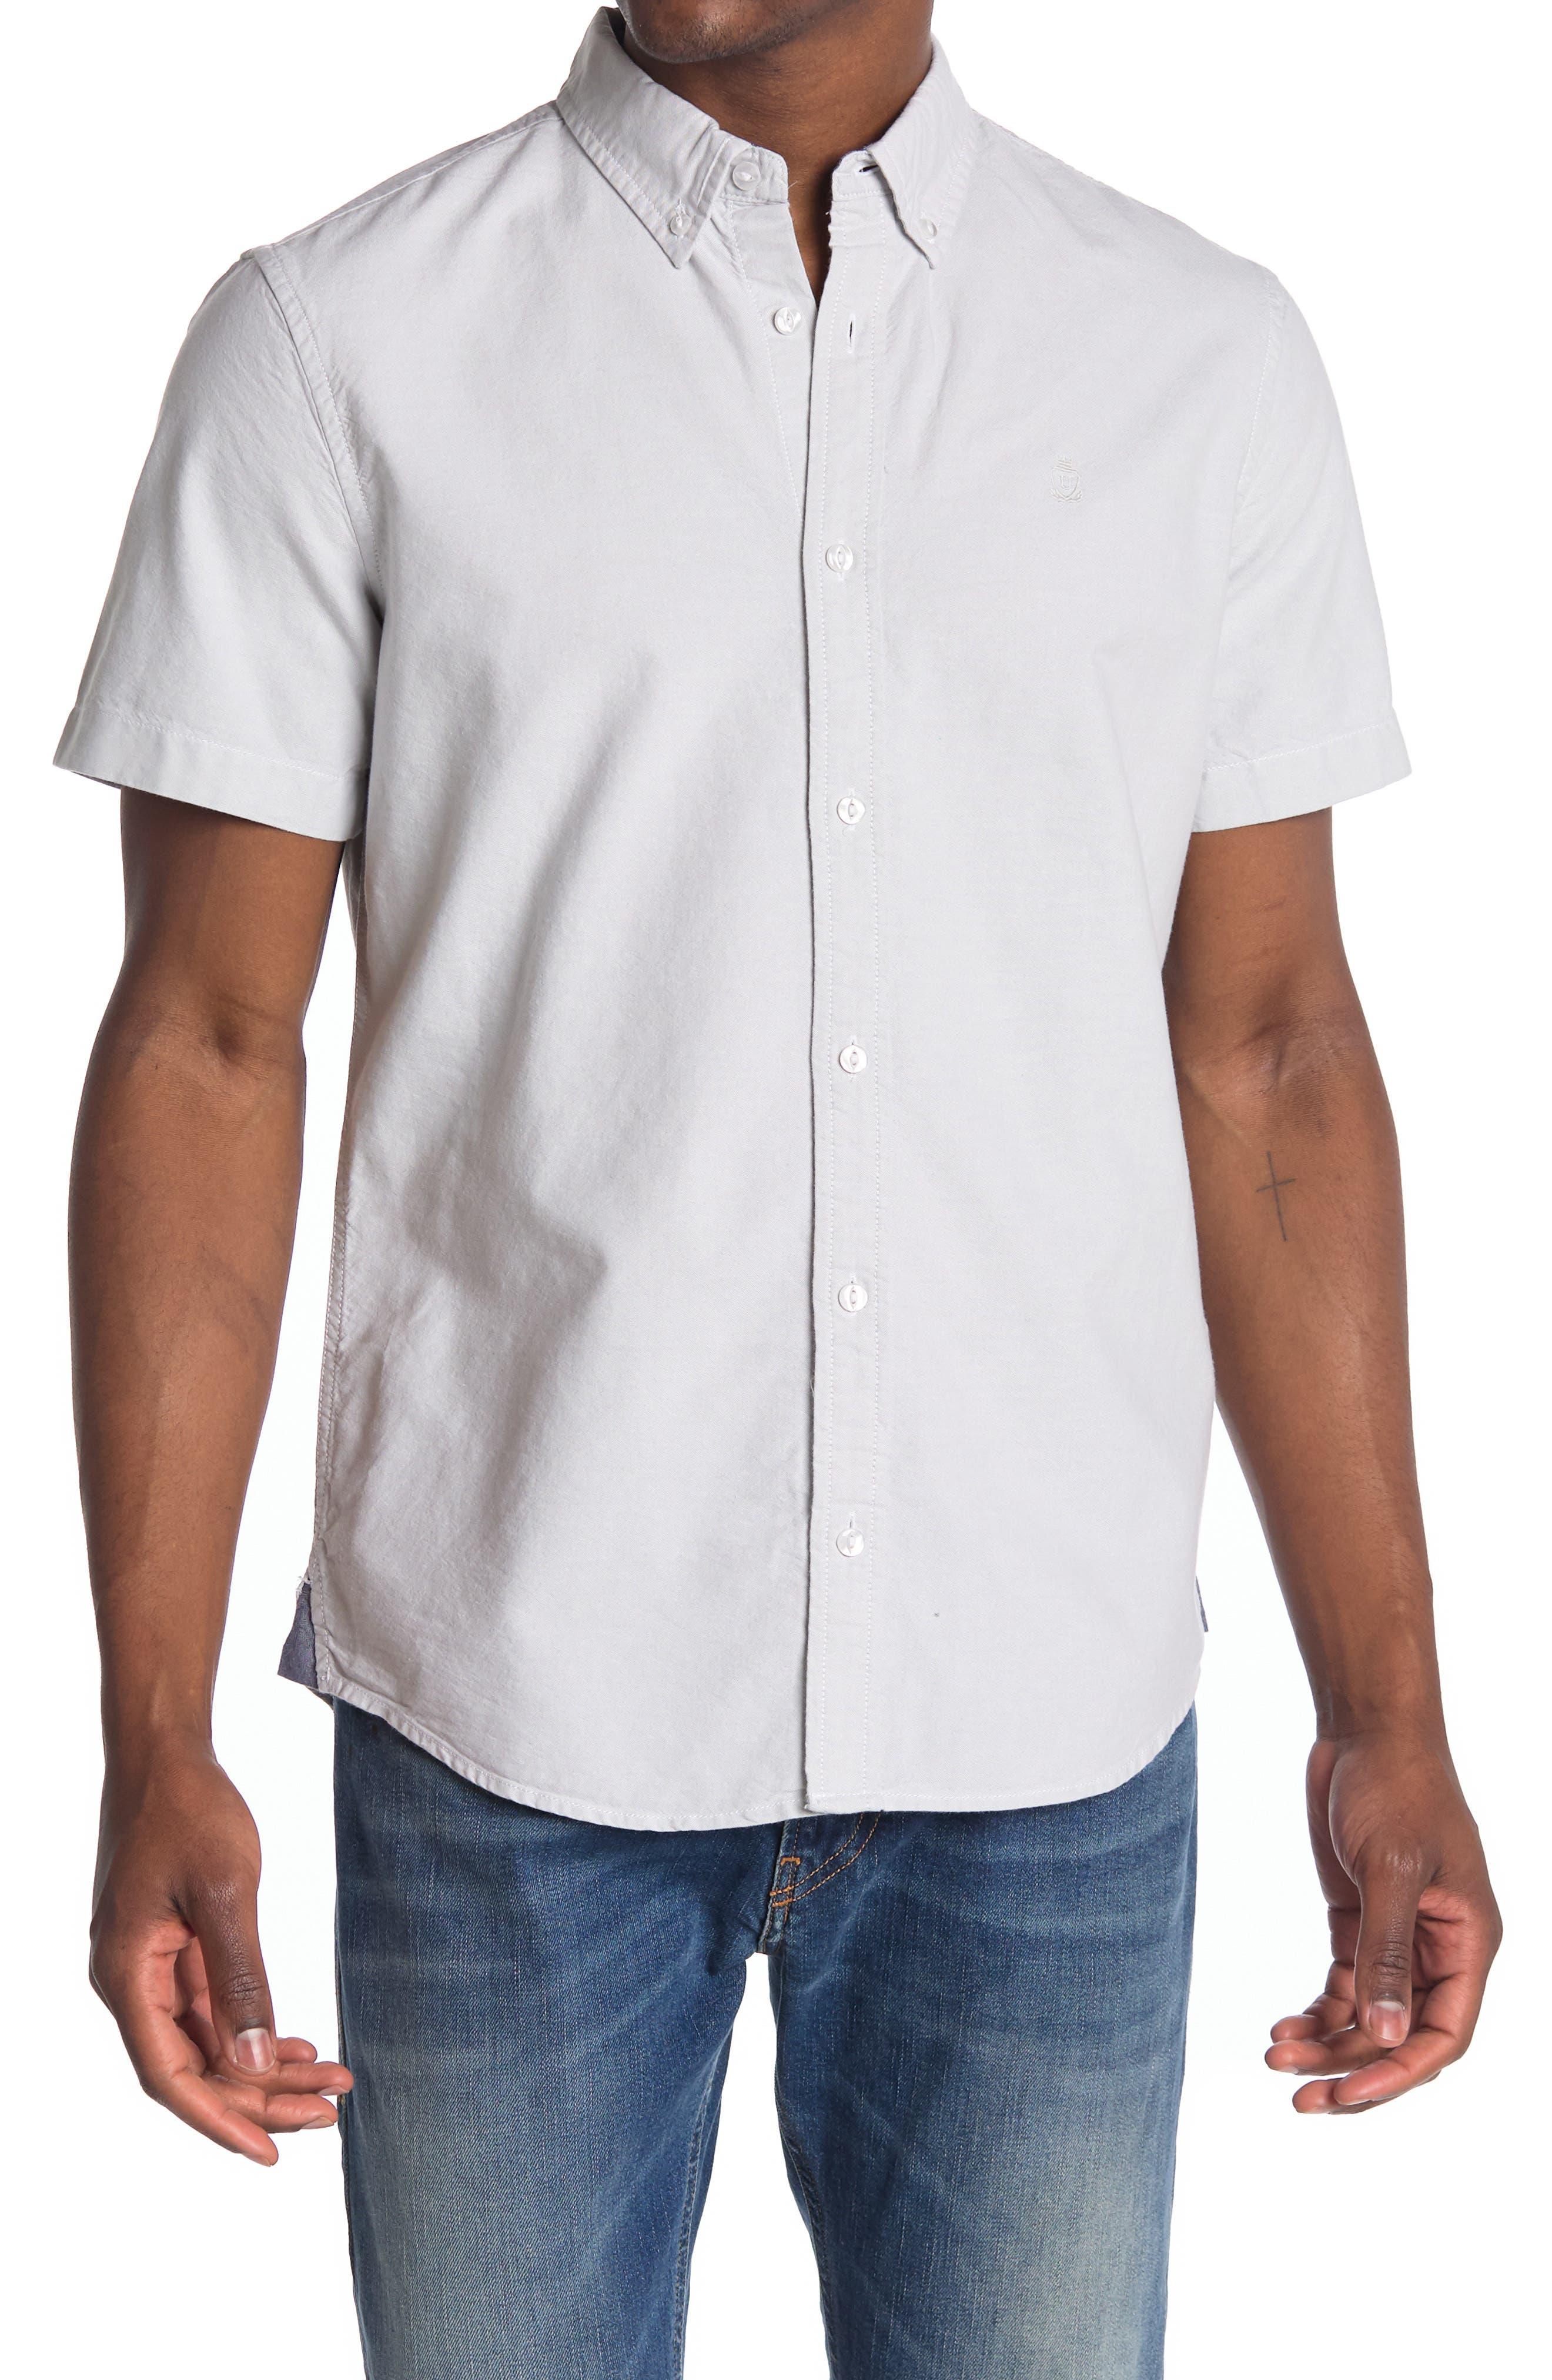 Image of 14th & Union Short Sleeve Oxford Shirt